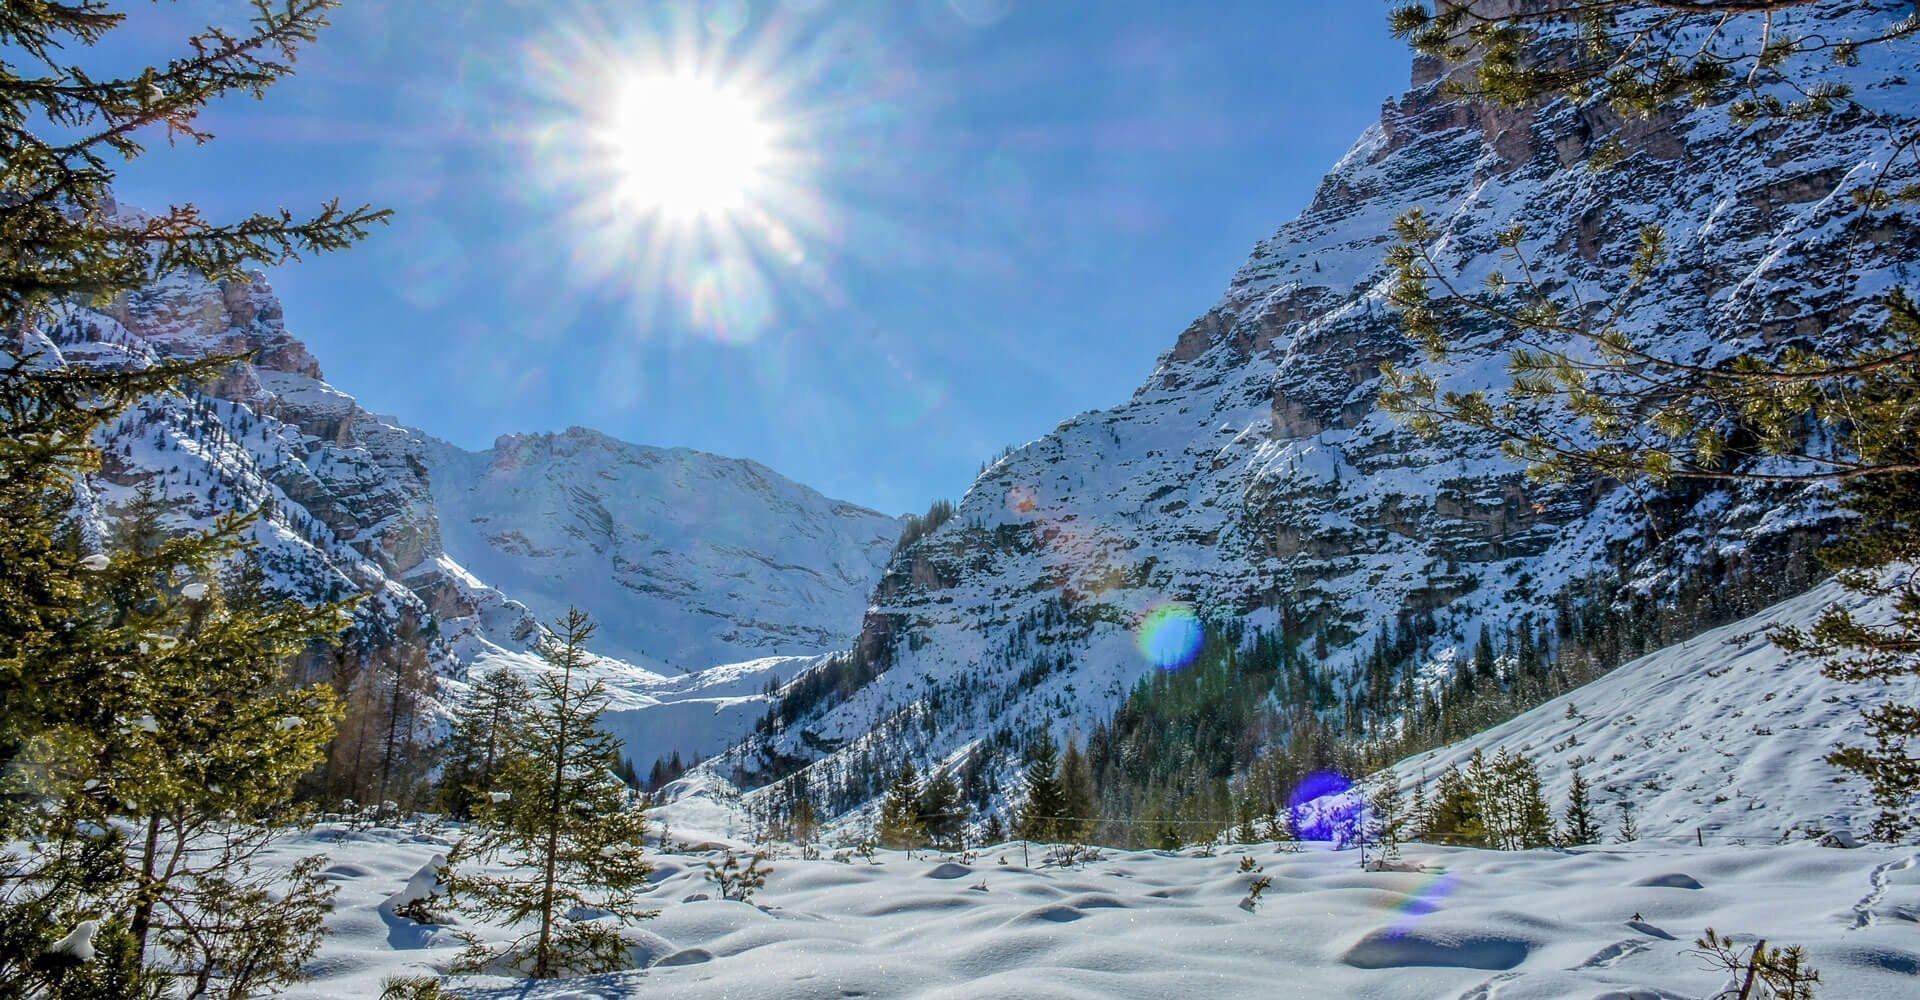 winterurlaub-st-vigil-enneberg